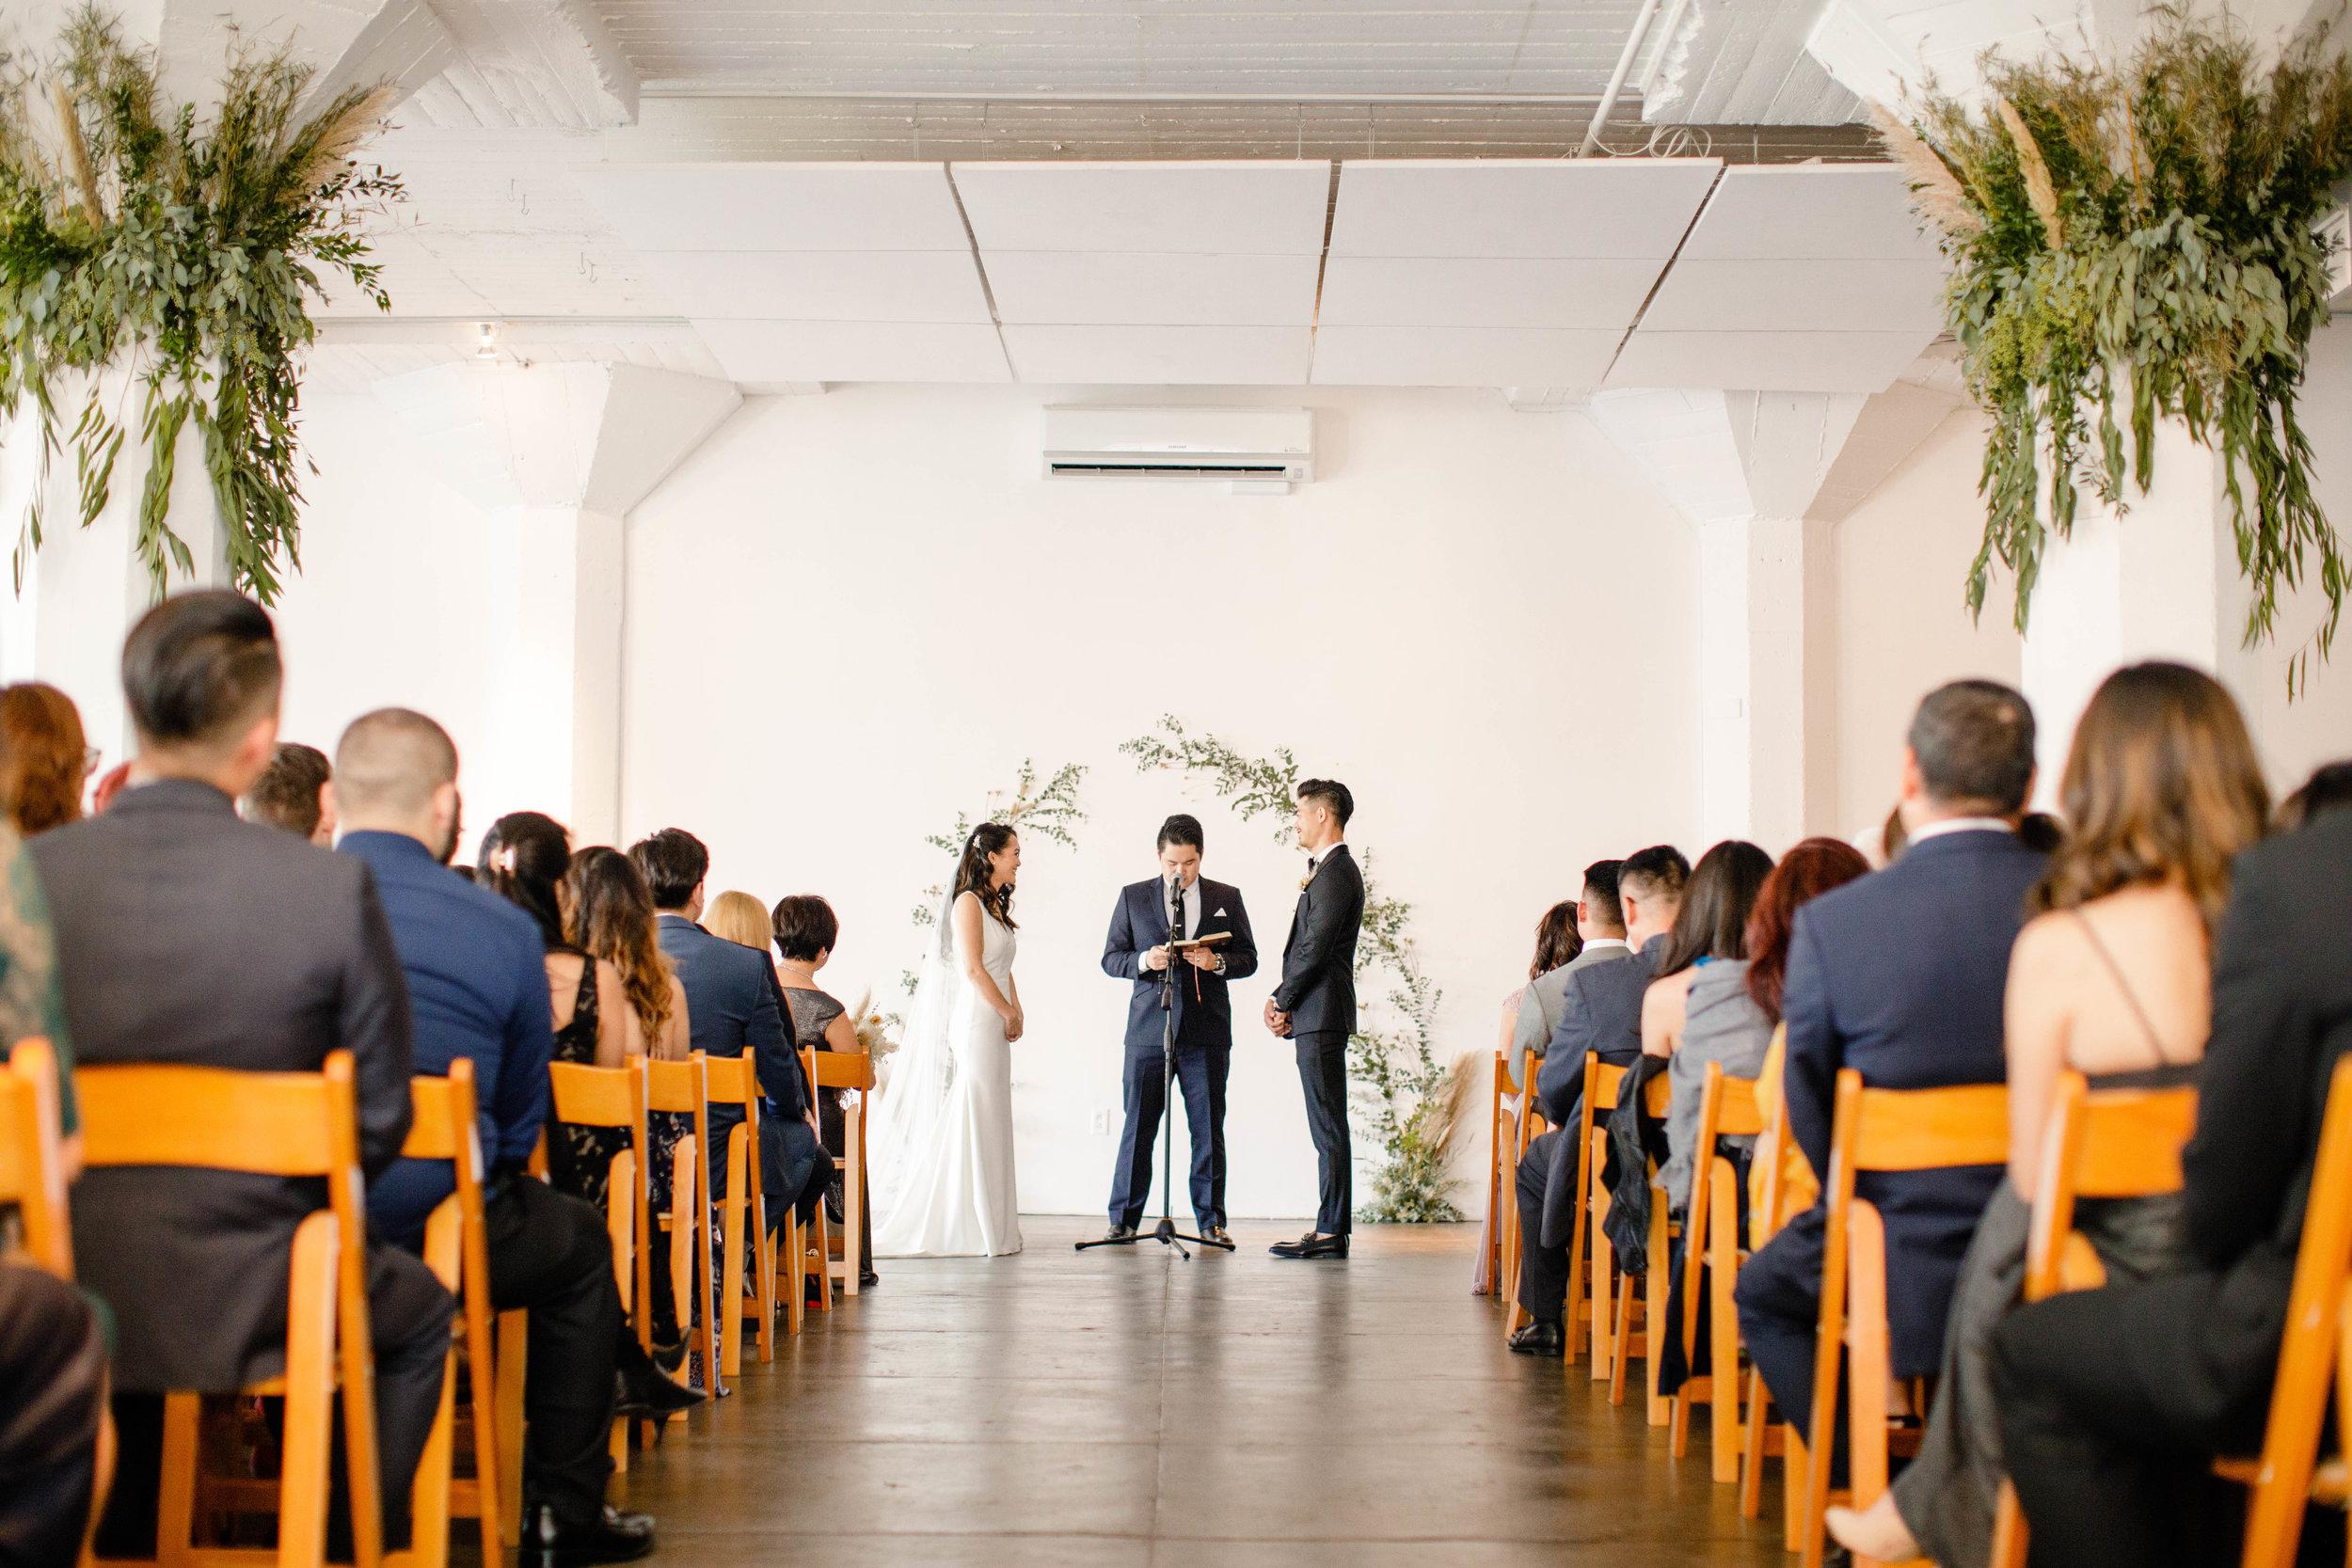 Dried_Flower_Wedding_Ceremony_InstallationSibyl_Sophia_Des_Moines_Iowa.jpg.jpg